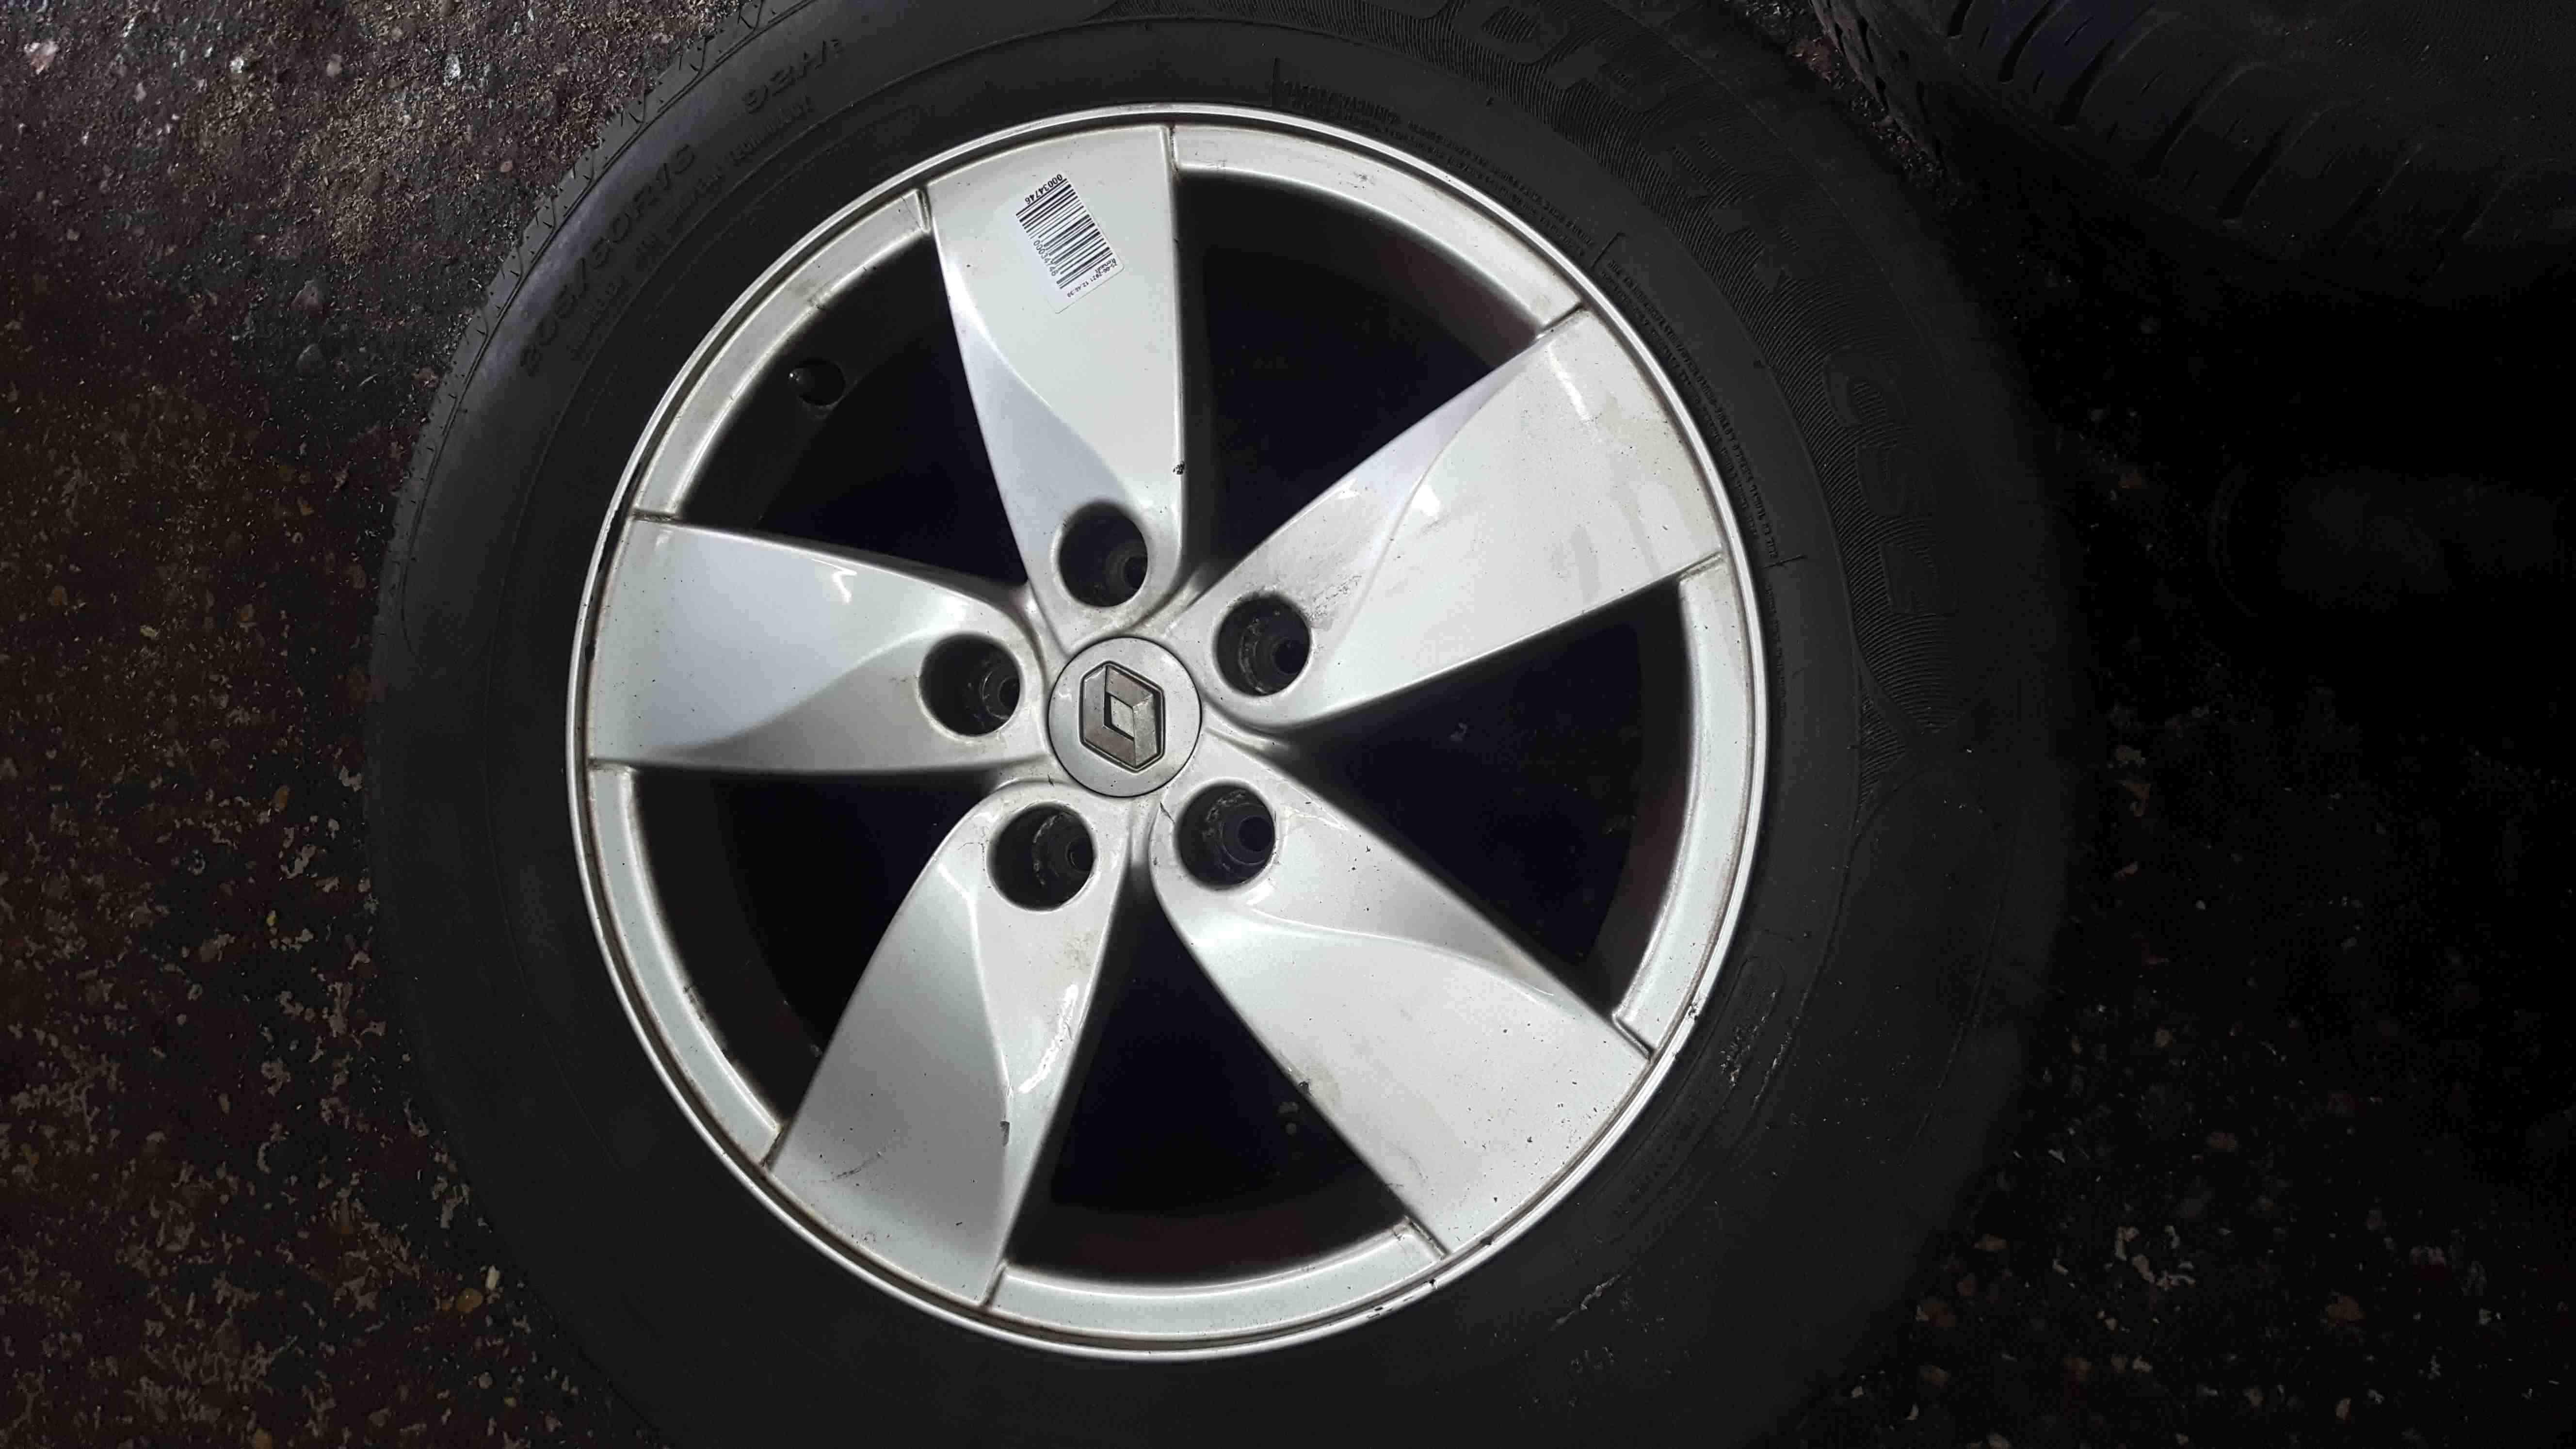 Renault Megane MK3 2008-2014 Proteus Alloy Wheel + Tyre 205 60 16 5mm 403000064R